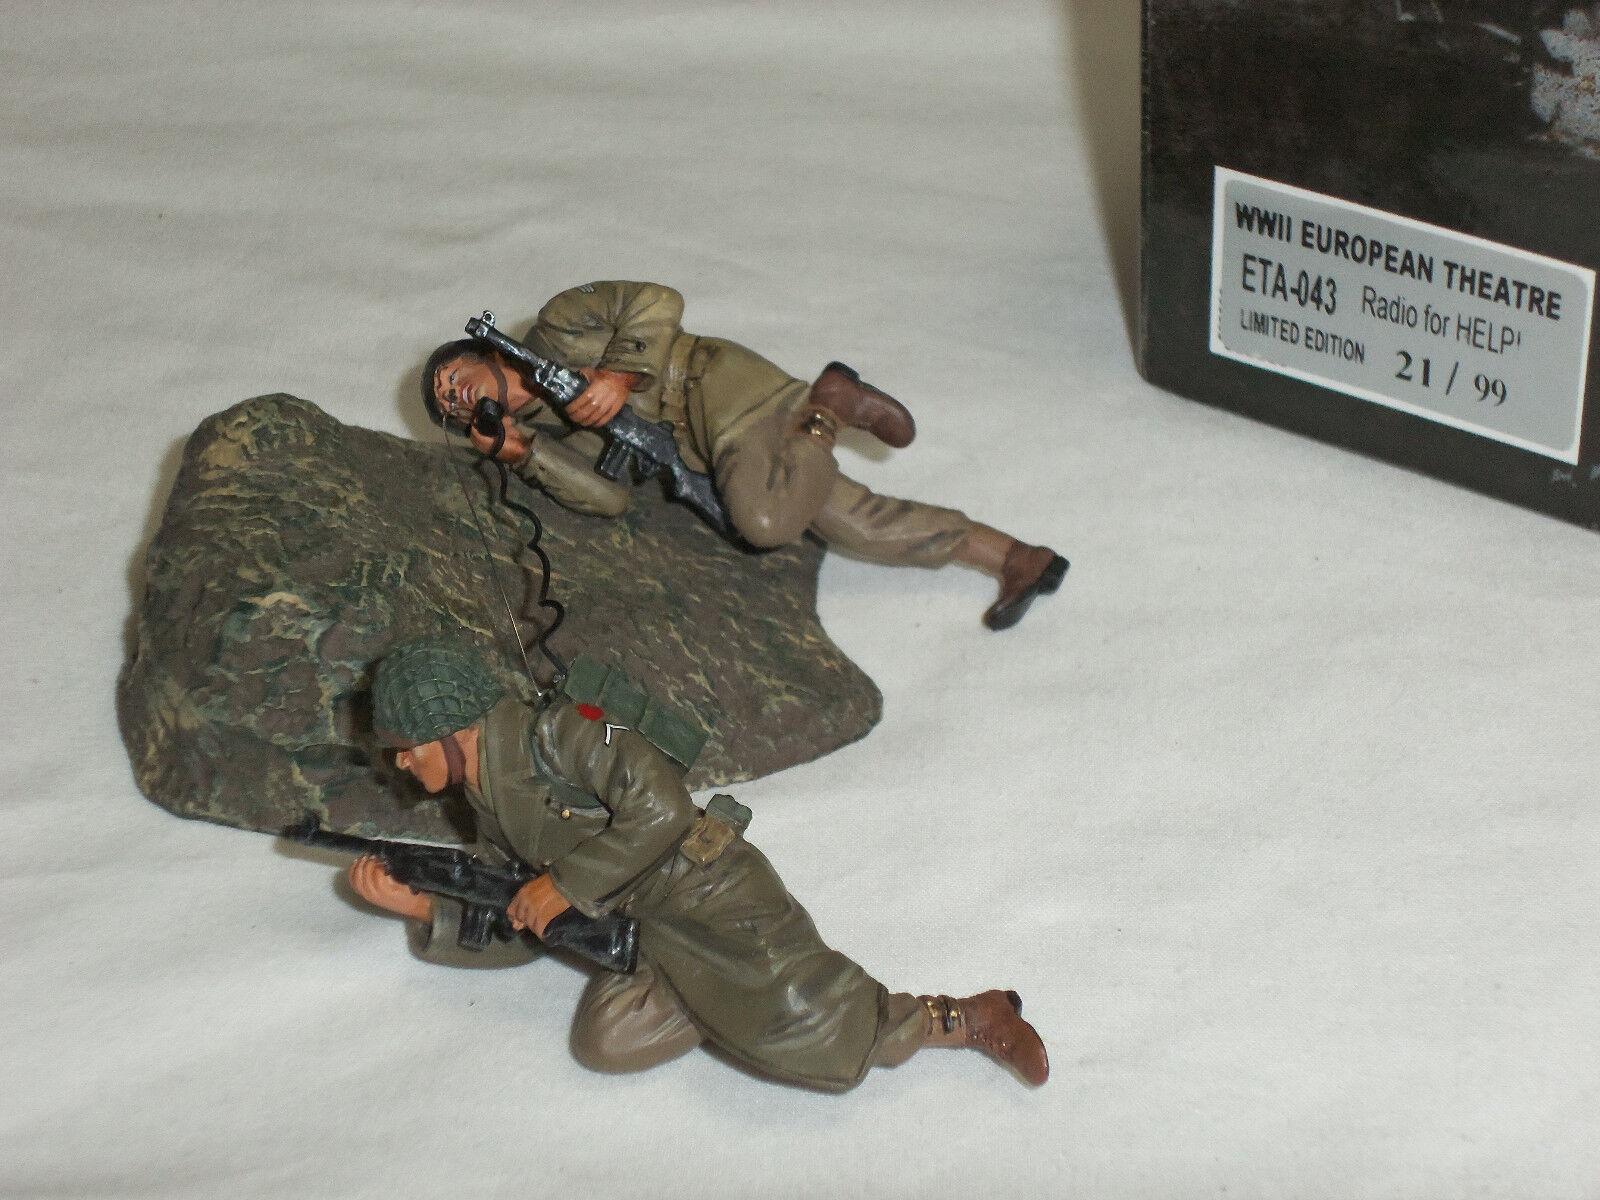 FIGARTI ETA043 BRITISH ARMY RADIO FOR HELP OPERATOR METAL TOY SOLDIER FIGURE SET